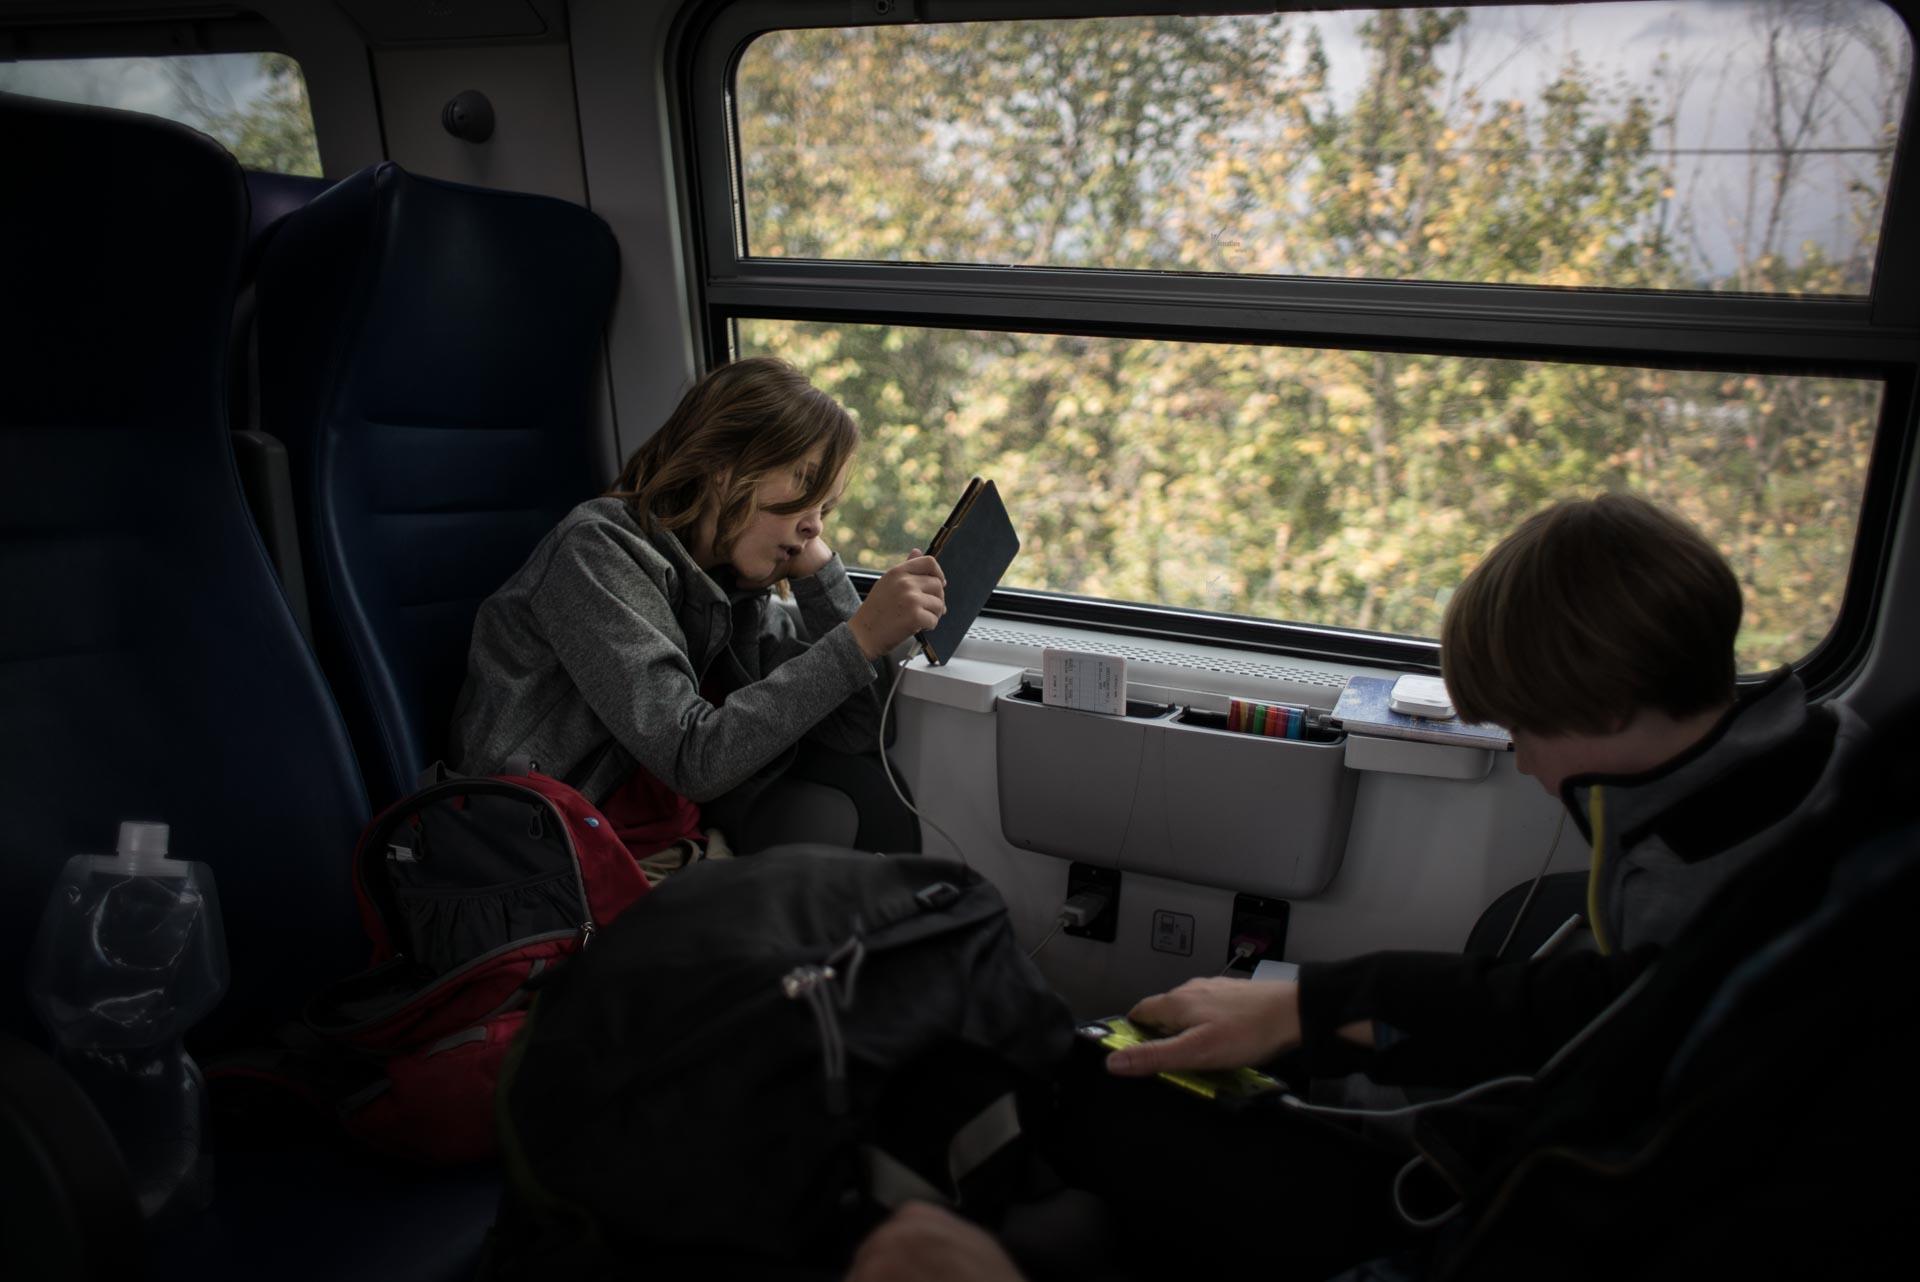 eco friendly travel on a train